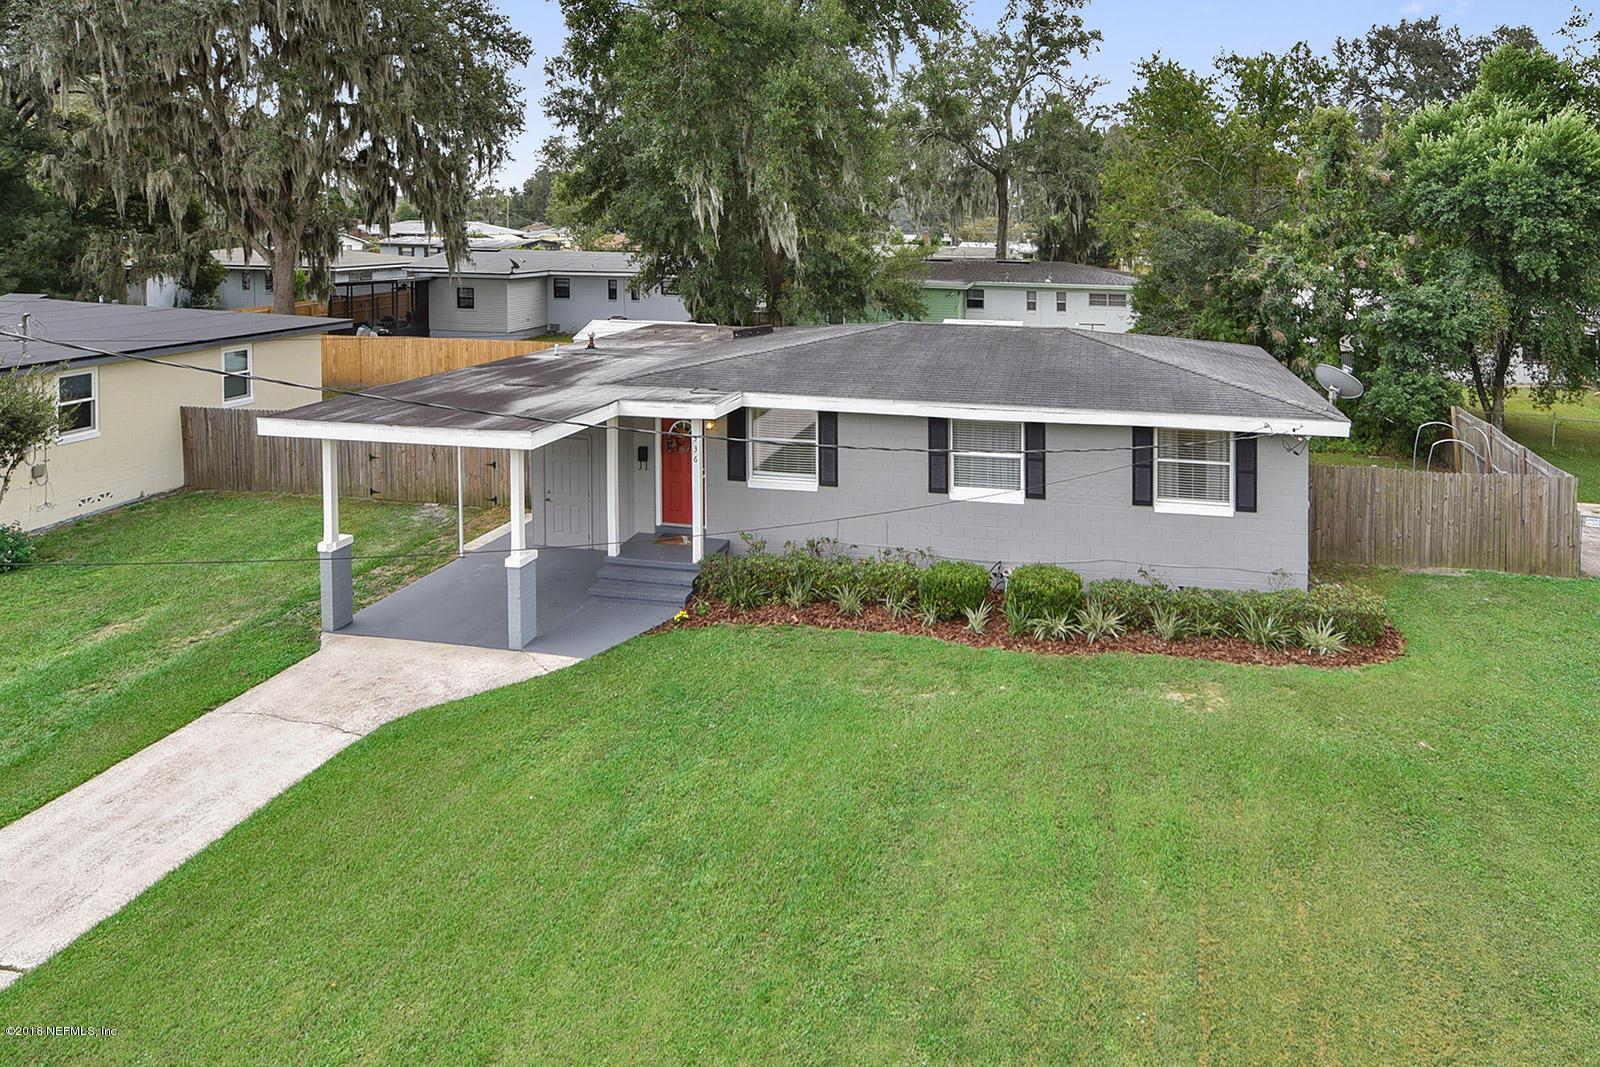 336 DENISE, JACKSONVILLE, FLORIDA 32218, 3 Bedrooms Bedrooms, ,1 BathroomBathrooms,Residential - single family,For sale,DENISE,963256